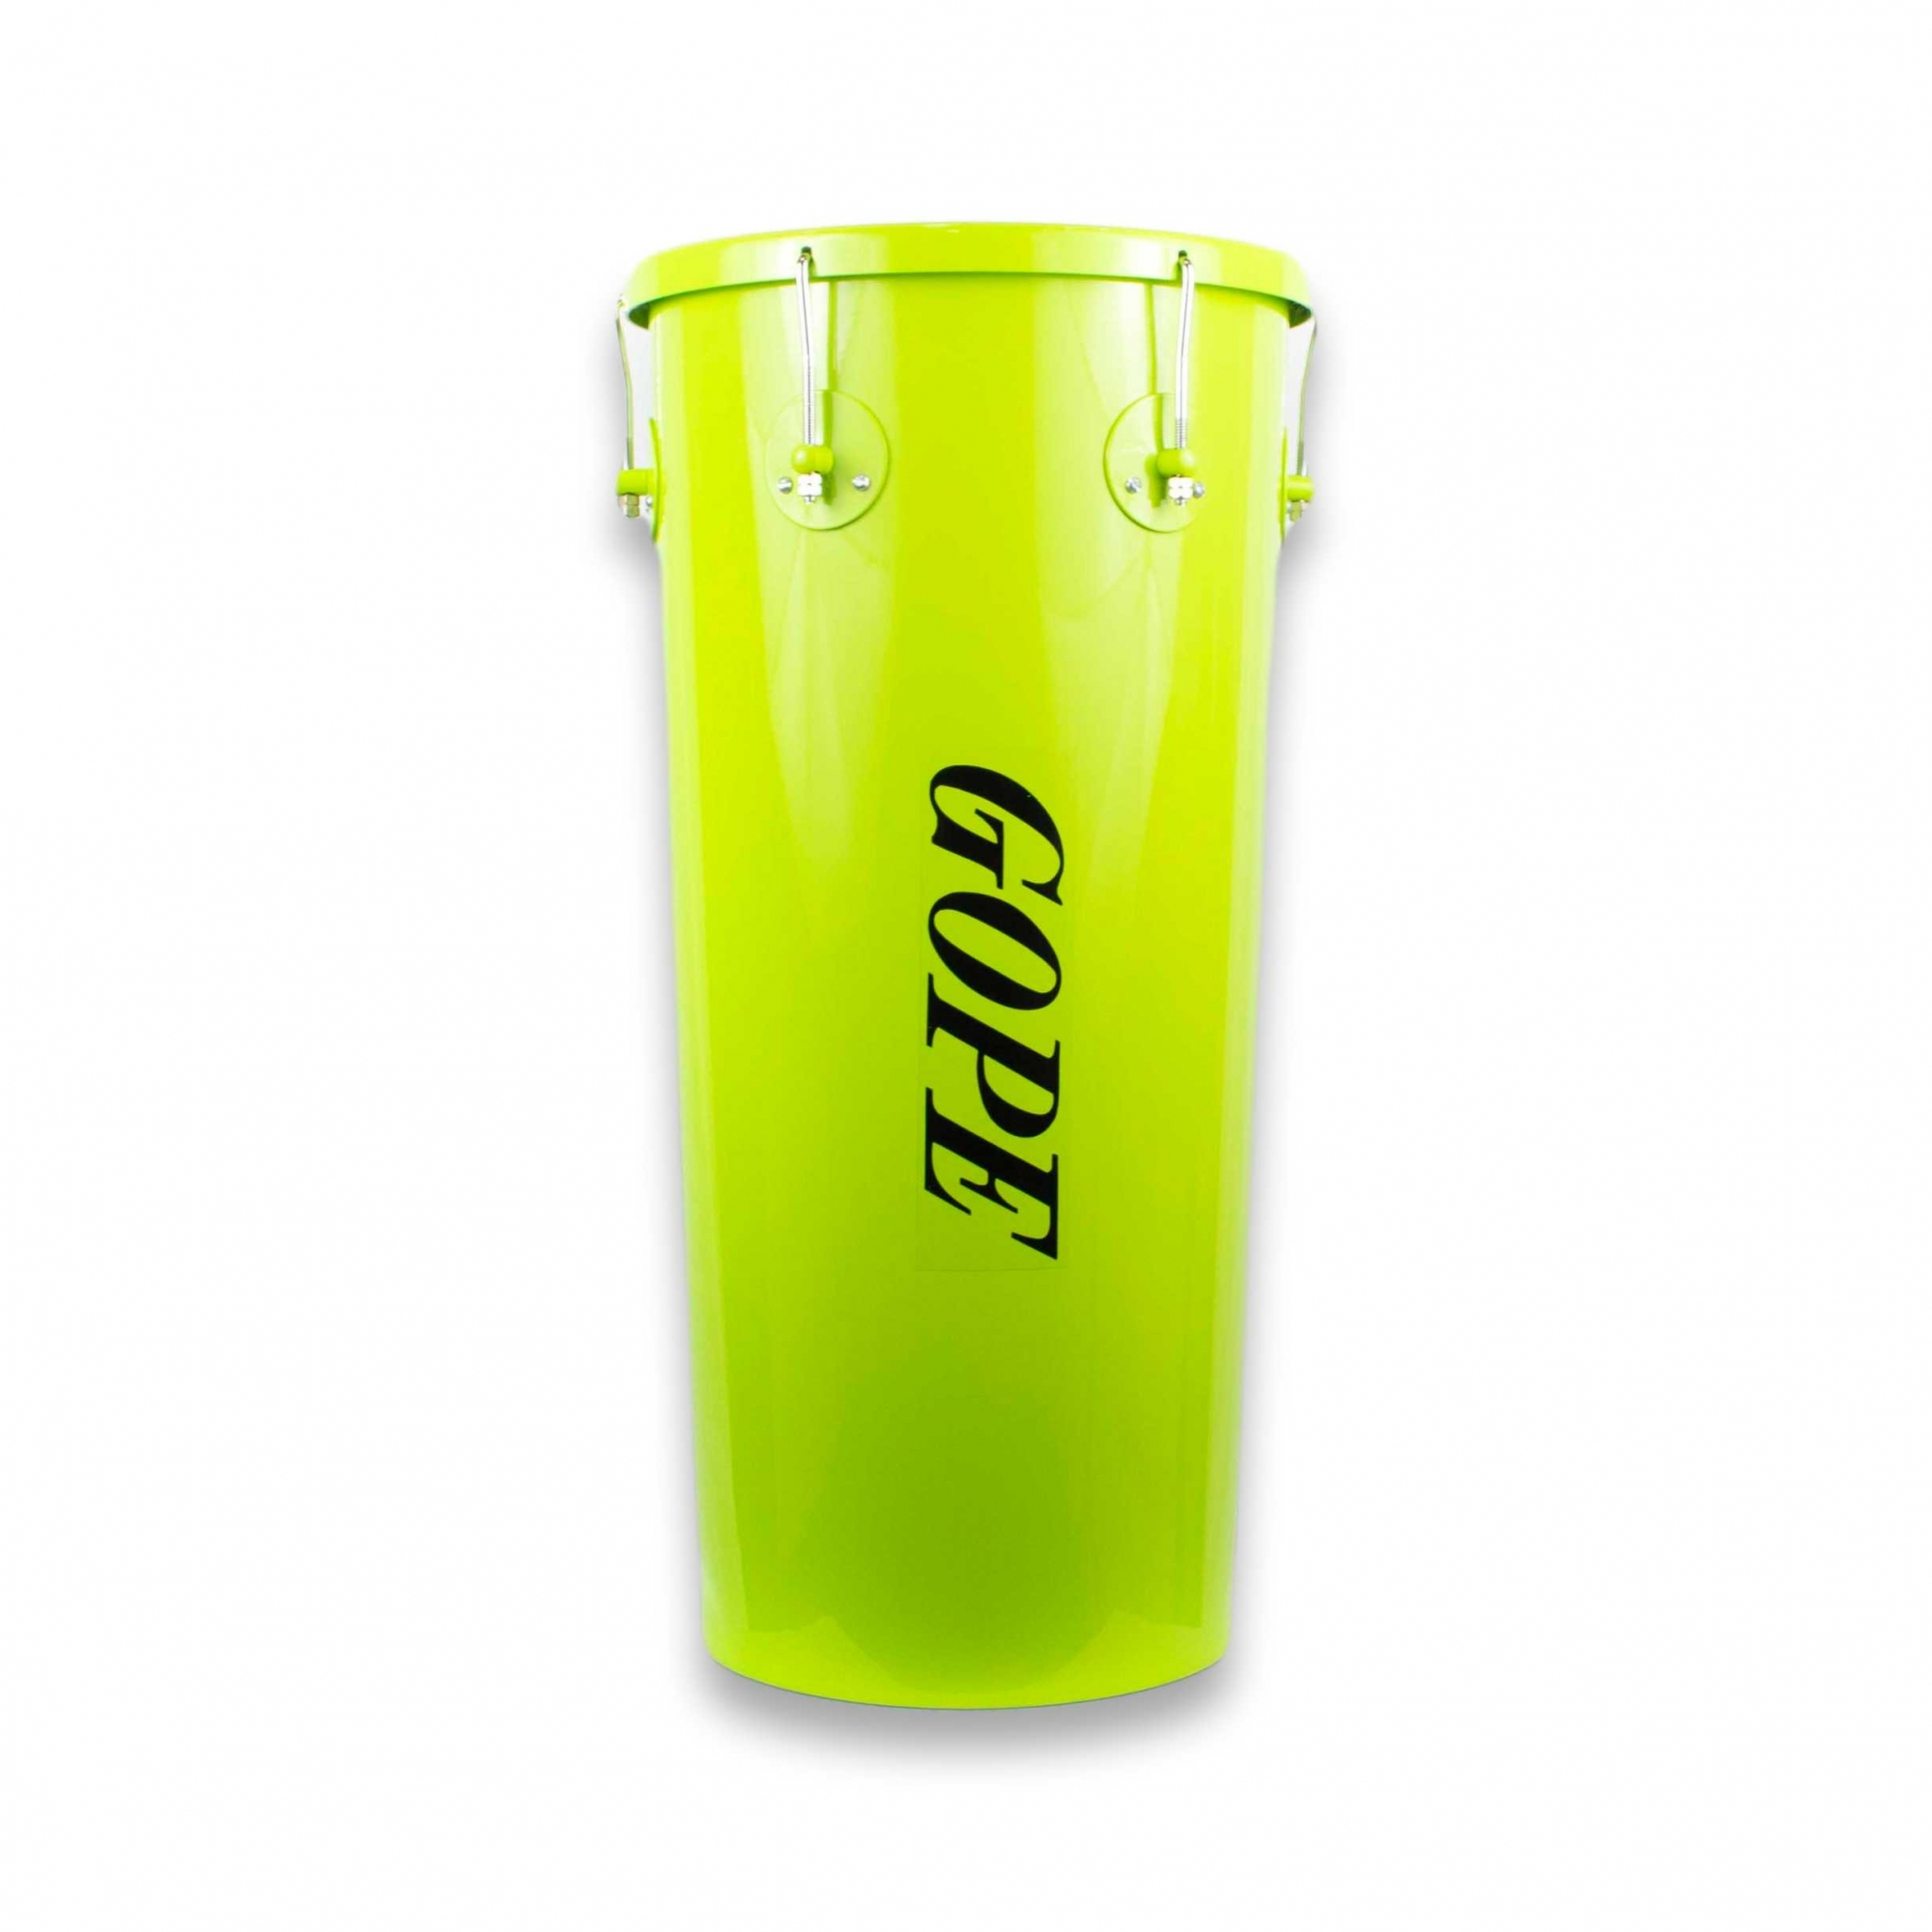 Rebolo Tantan Gope 12 pol 65 cm Verde Limao